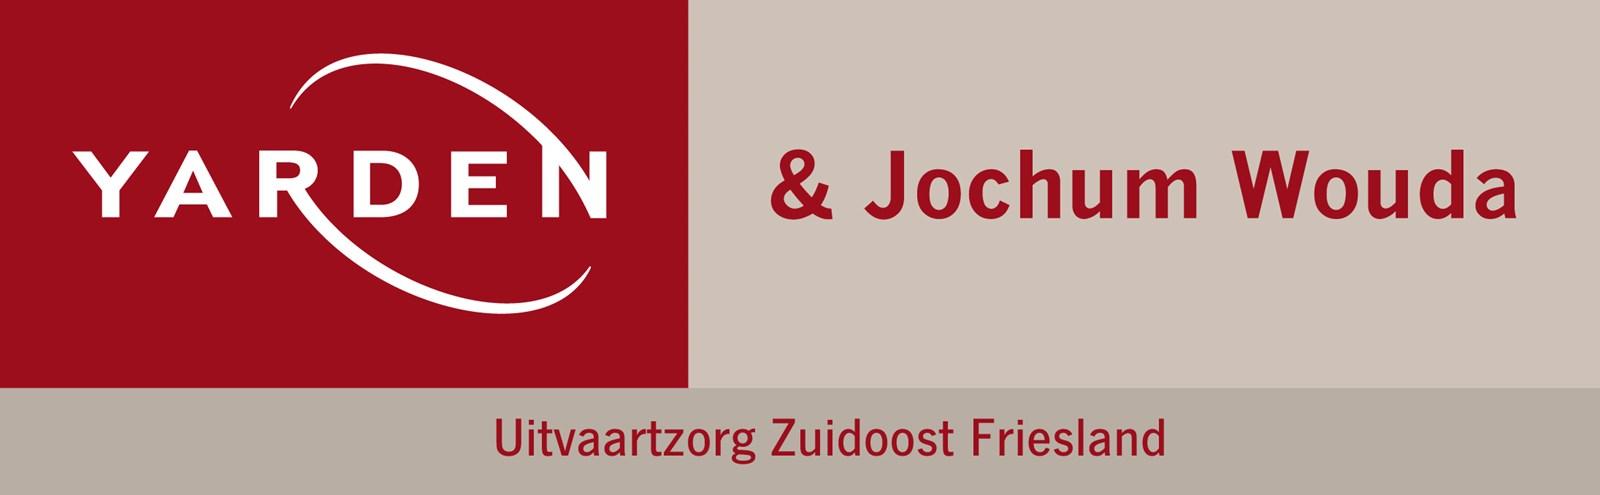 Logo van Yarden & Jochum Wouda Uitvaartzorg Friesland